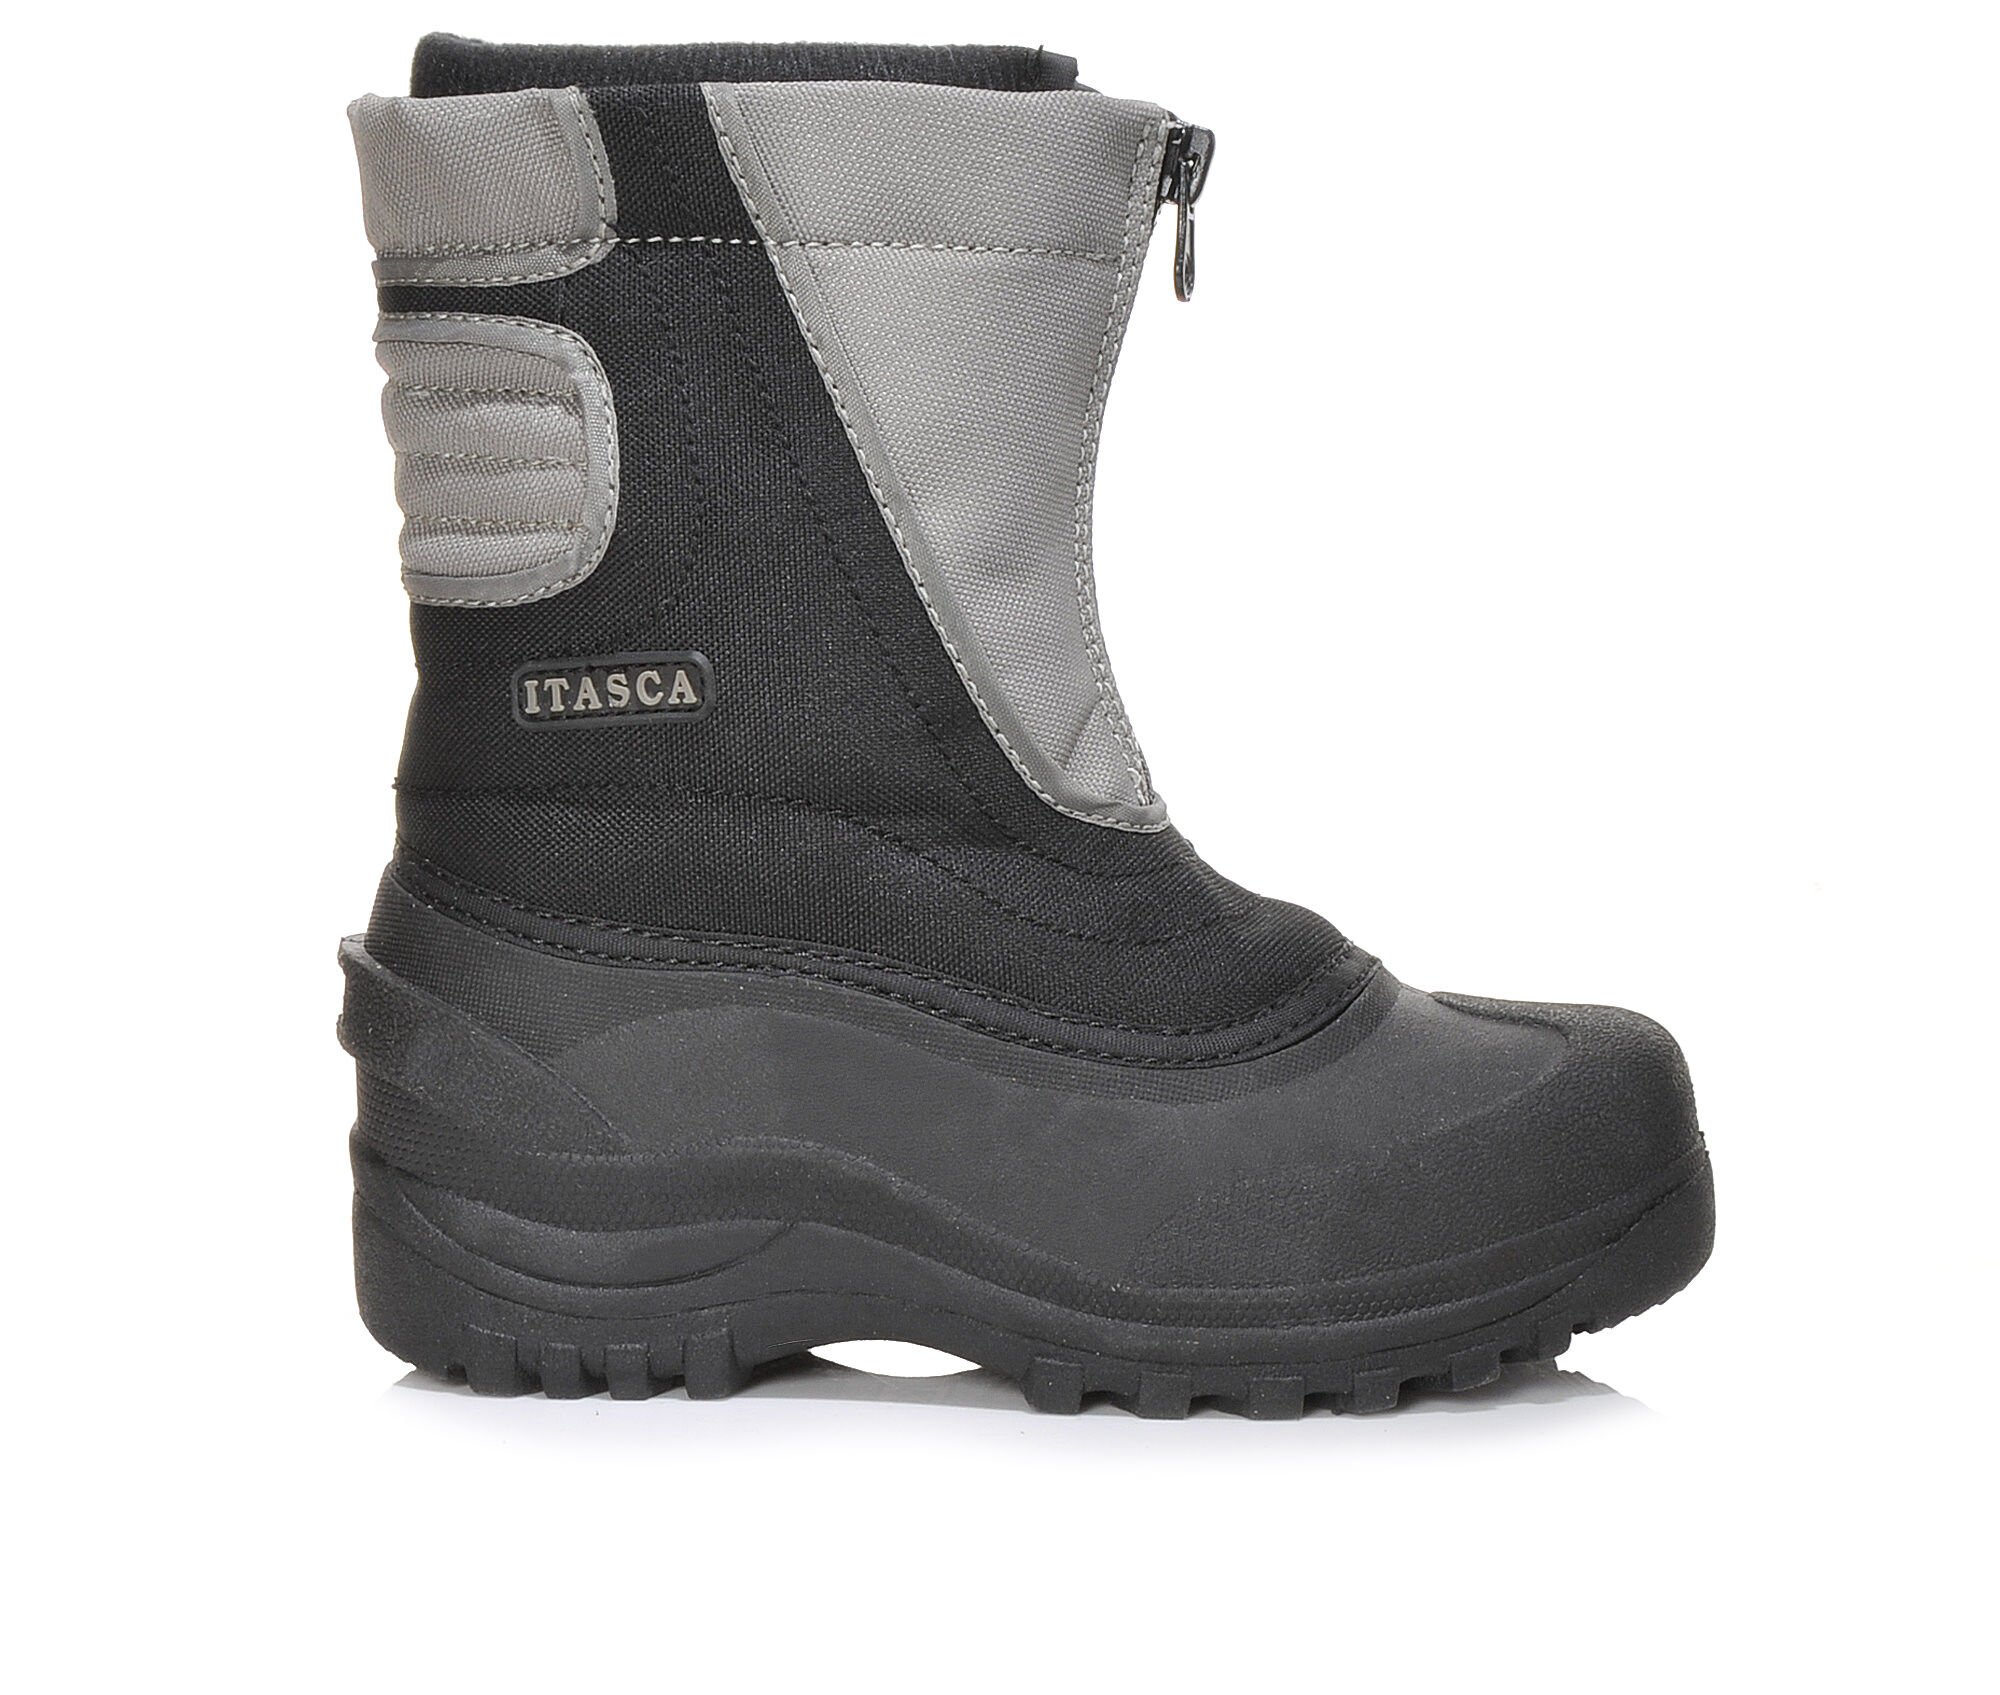 Boys Itasca Sonoma Snow Stomper 116 Winter Boots